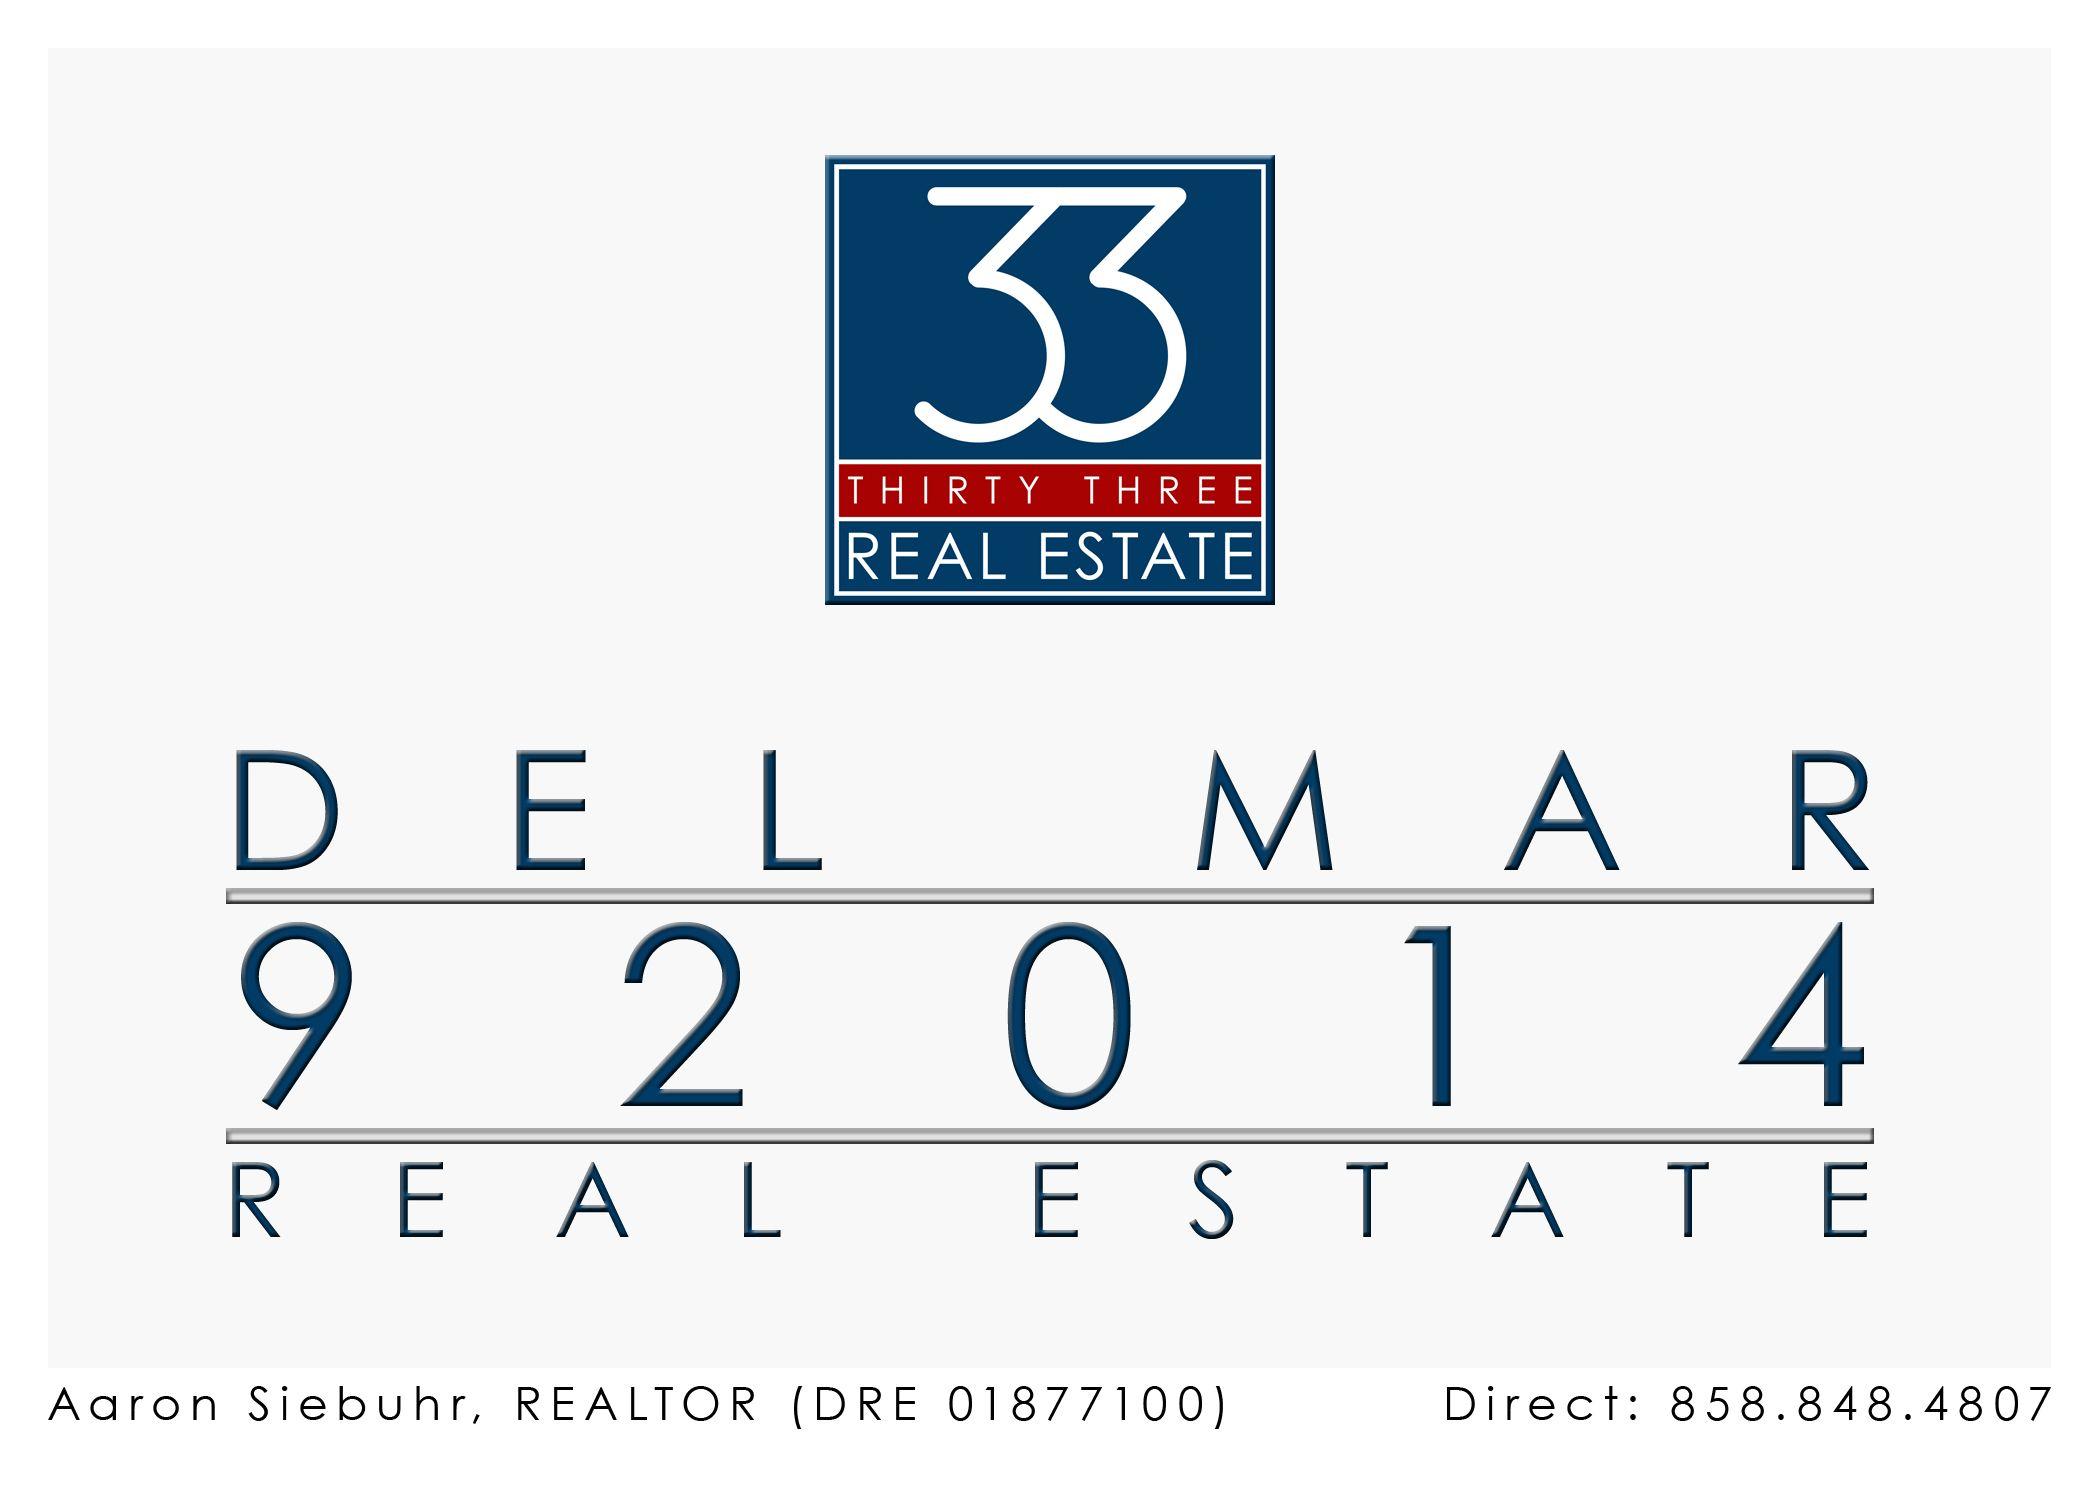 | 92014 | Del Mar | Del Mar Real Estate | Del Mar Homes | Del Mar Townhomes | Del Mar Condos | Del Mar Realtor | Moving to Del Mar | Buying Real Estate | Selling Real Estate | San Diego Realtor |